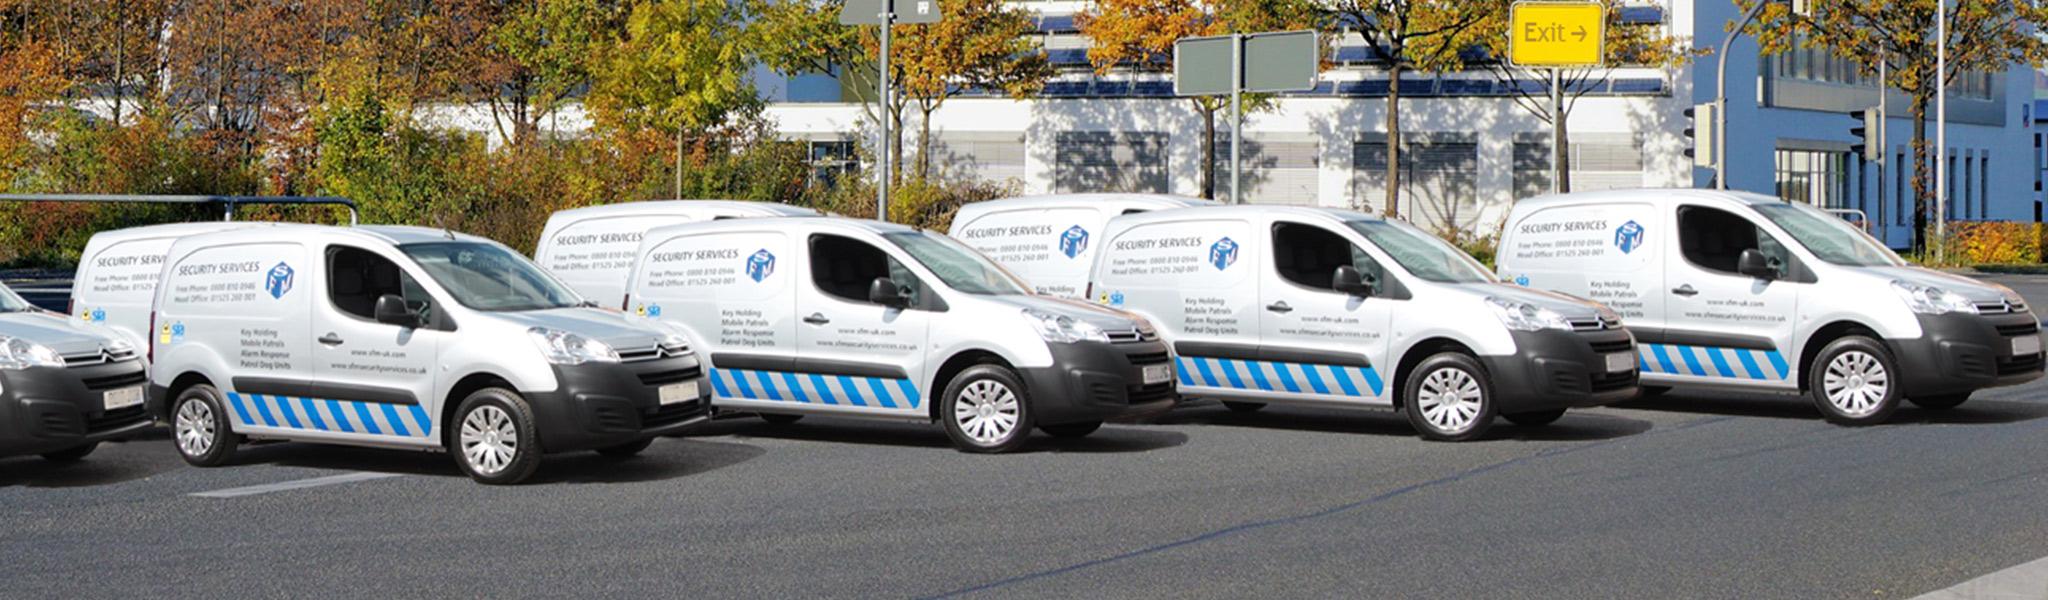 Mobile Patrol Service